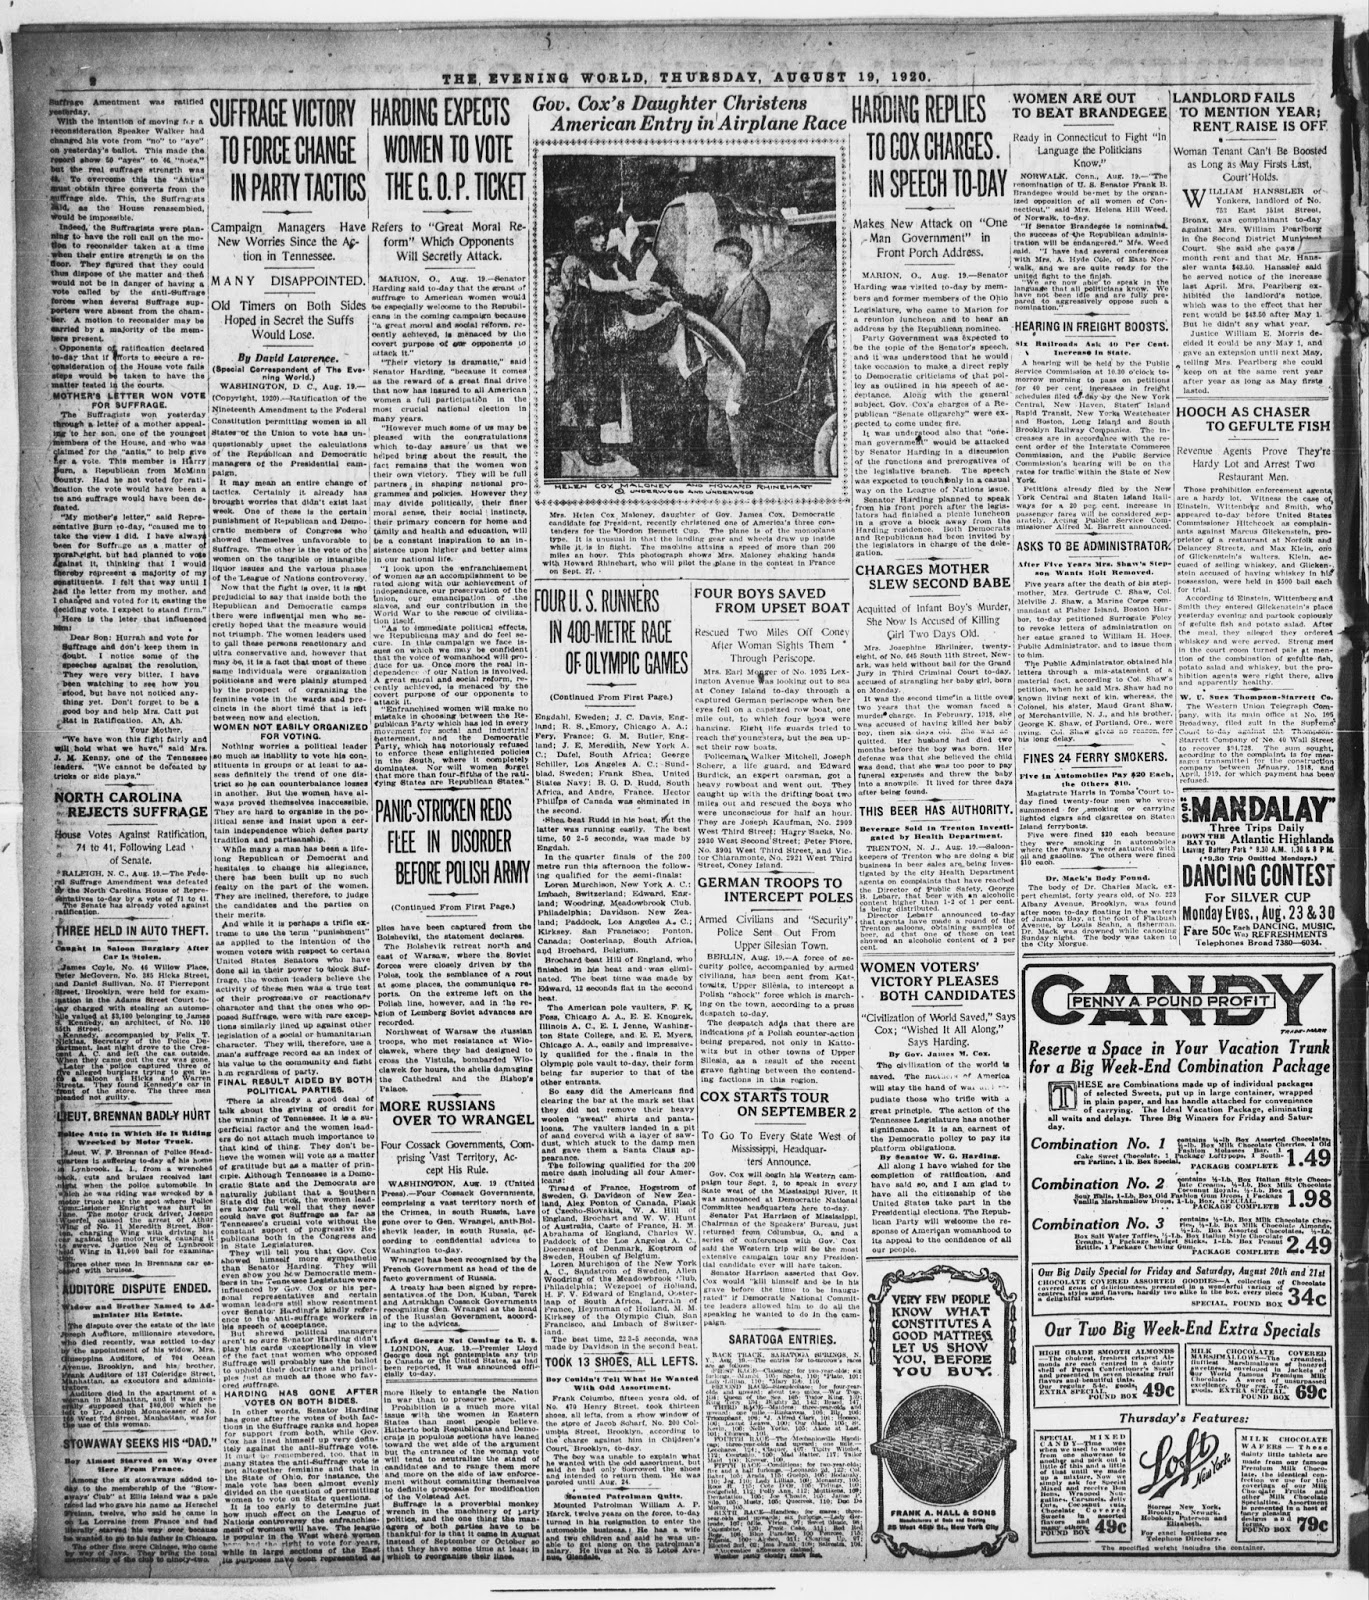 the evening world thursday august 19 1920